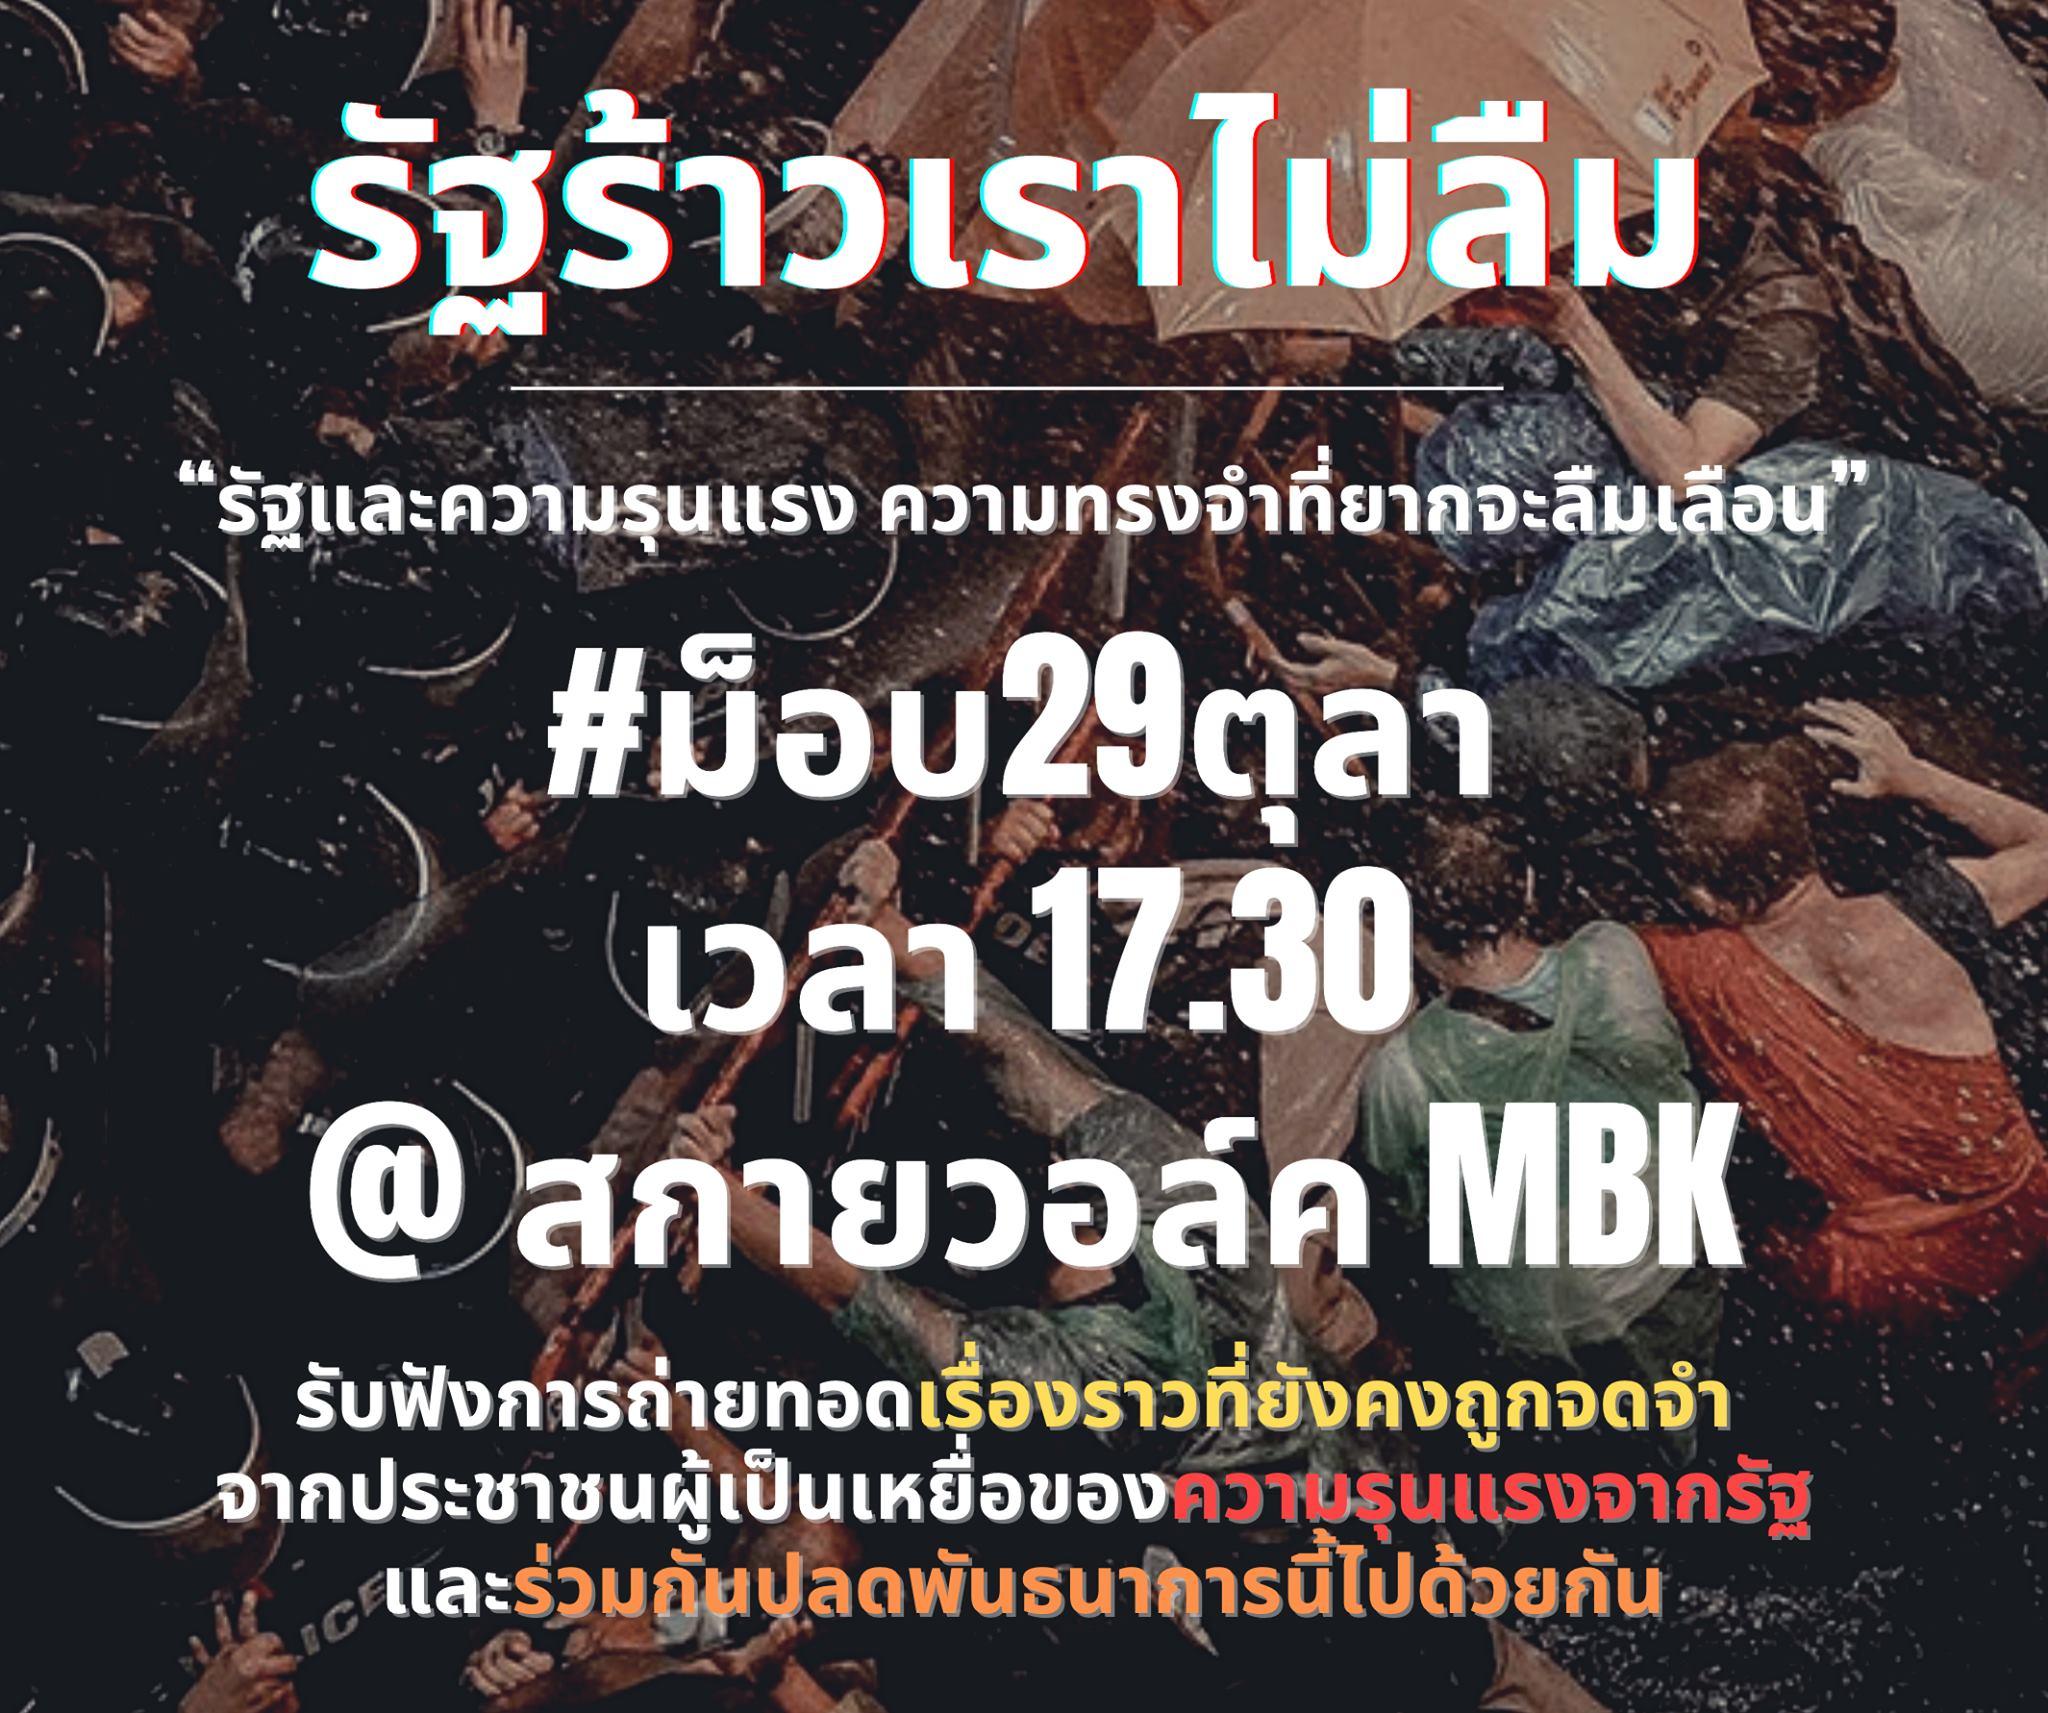 www.thaiguide.dk/images/forum/Demo-2020/demo-varsel-29-10-20.jpg